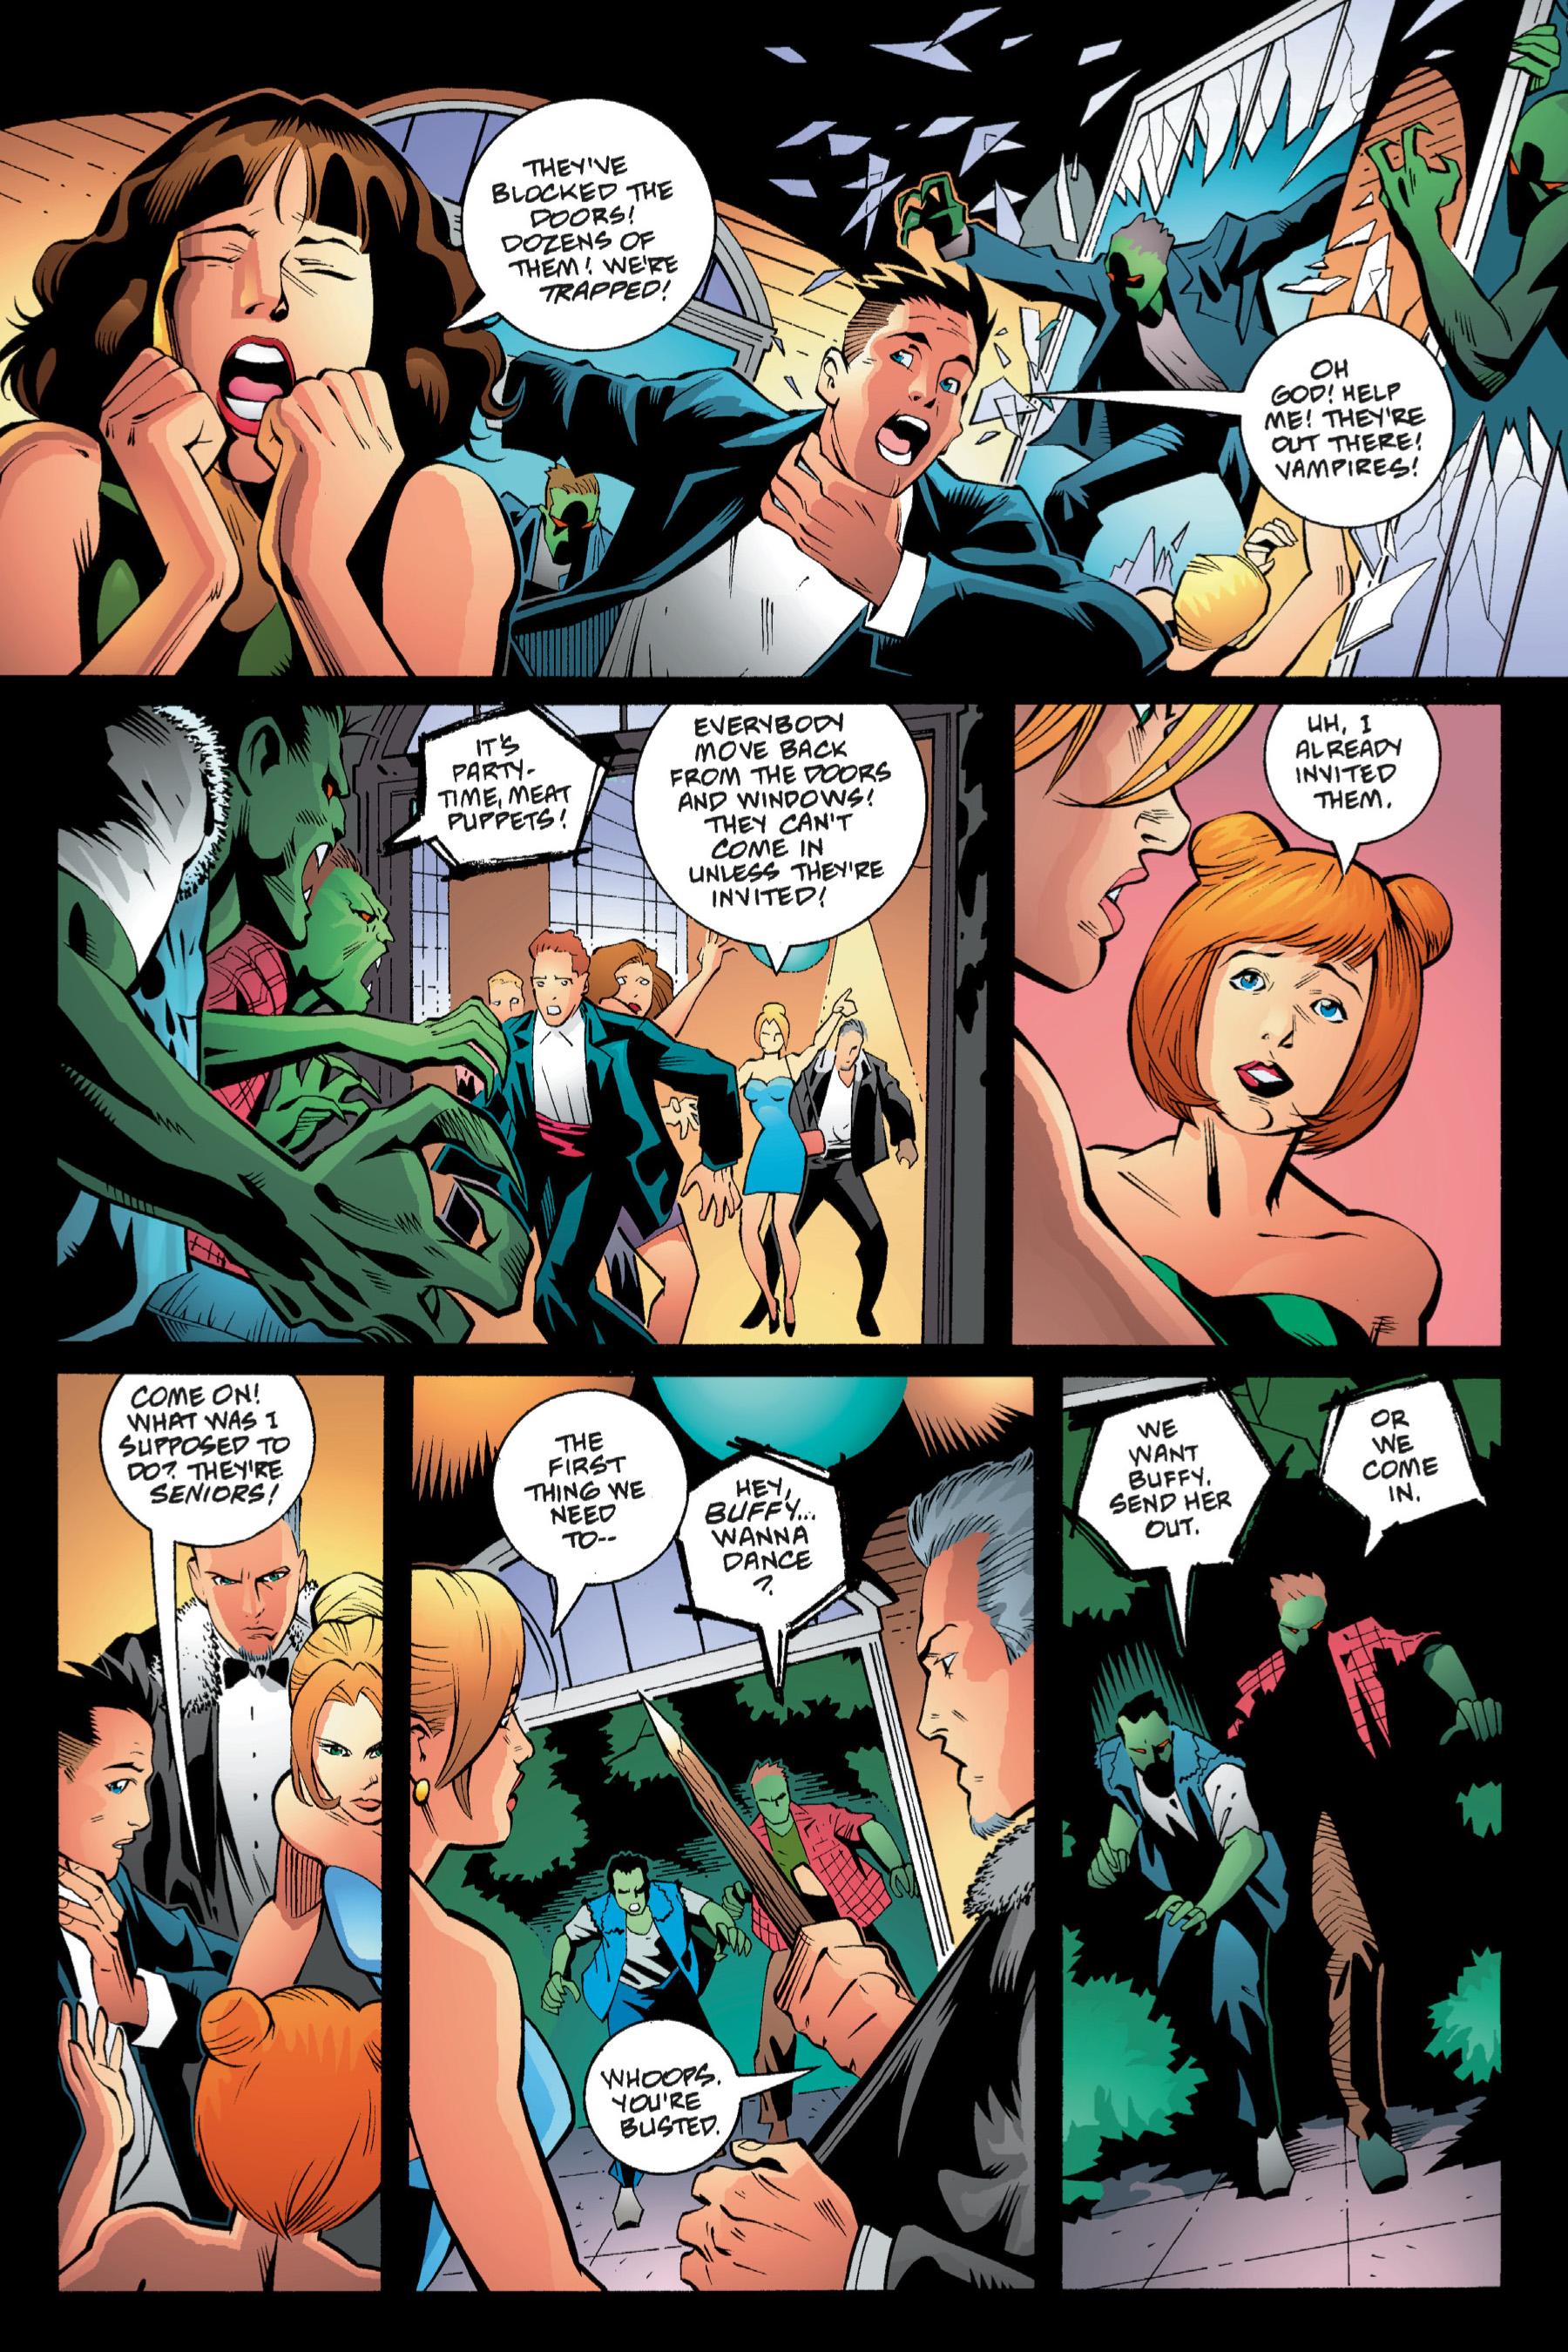 Read online Buffy the Vampire Slayer: Omnibus comic -  Issue # TPB 1 - 88